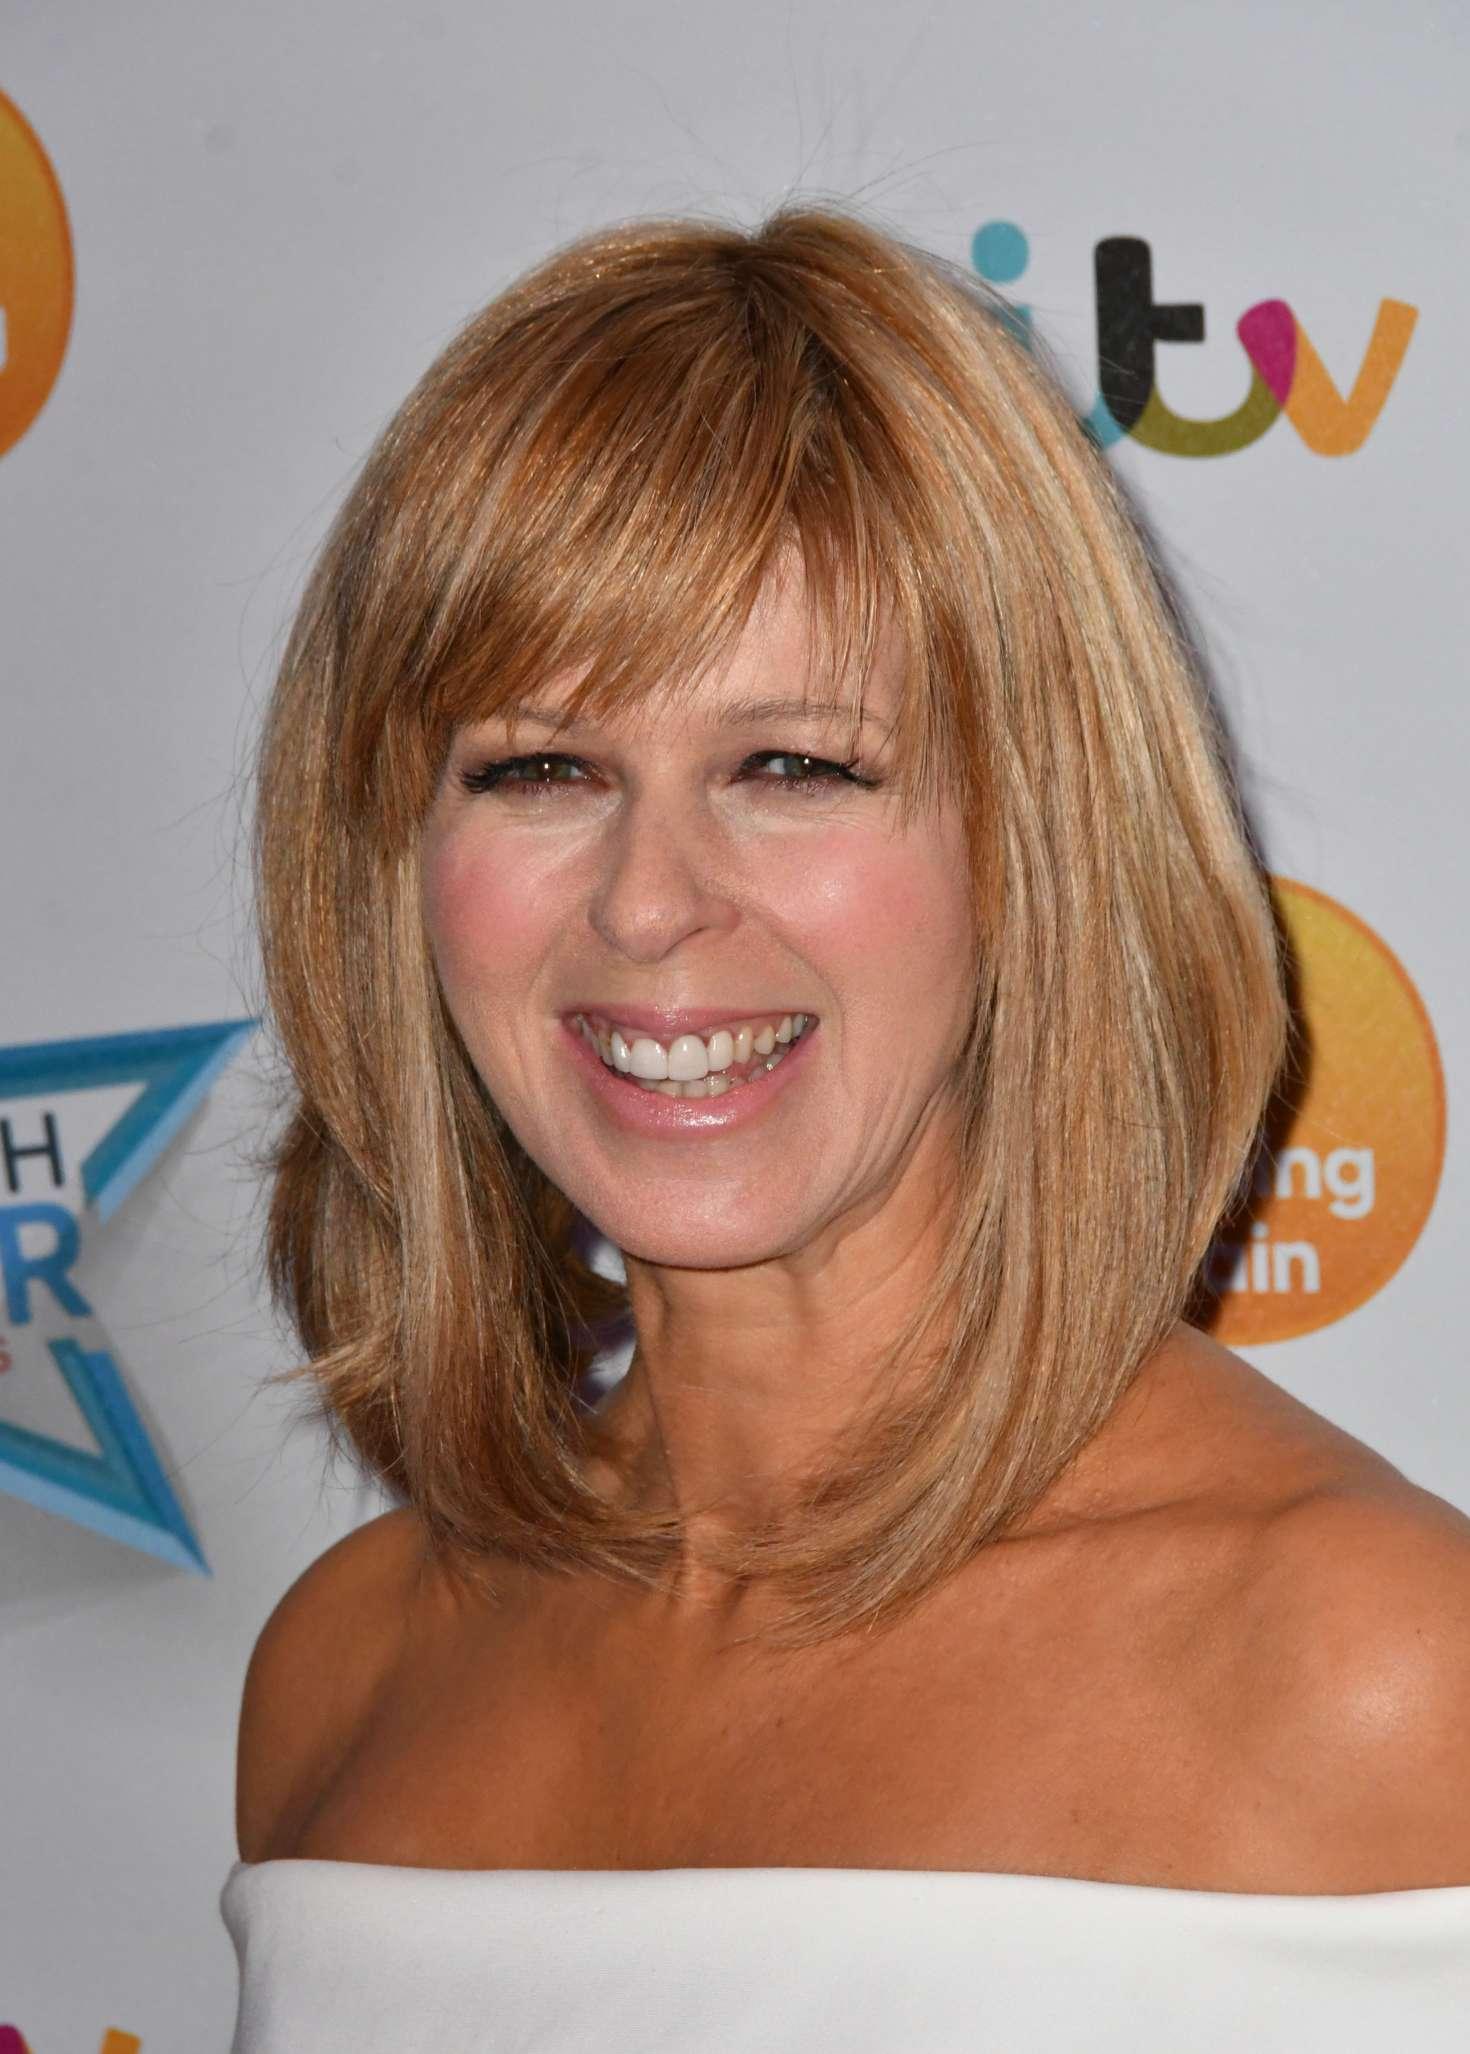 kate garraway - 'good morning britain' health star awards in london